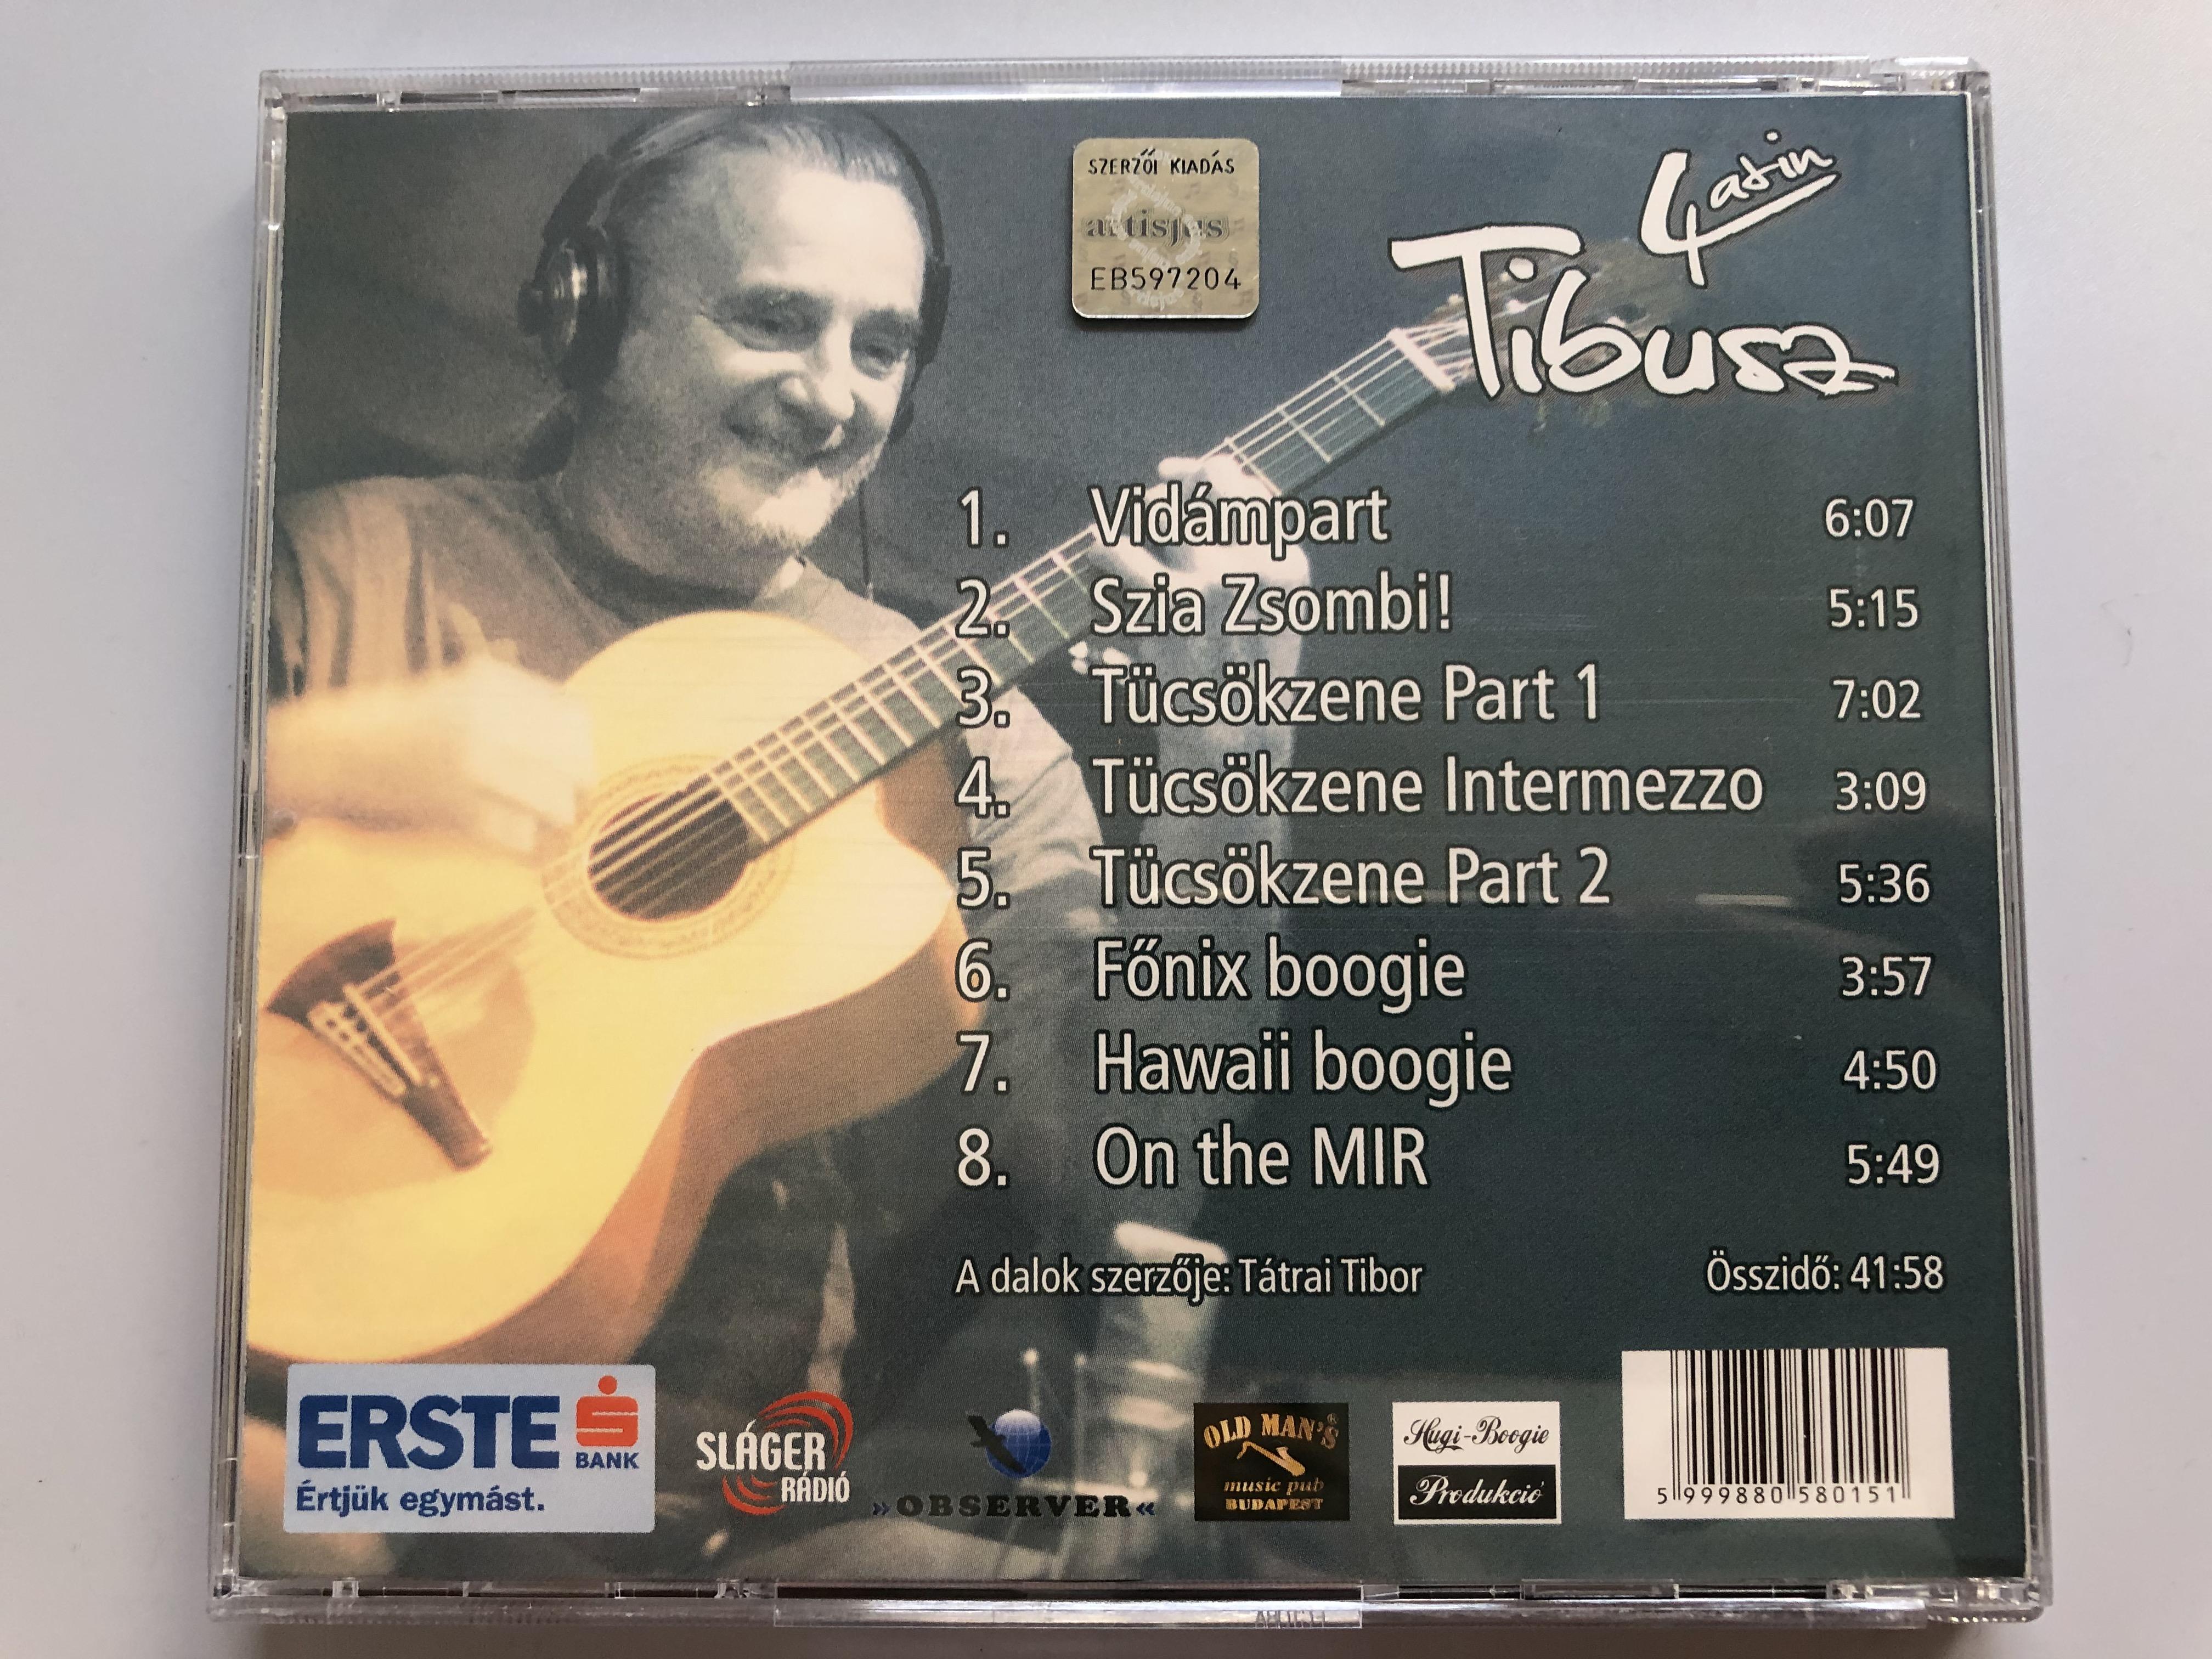 tibusz-4-latin-audio-cd-2007-bh-010-5-.jpg